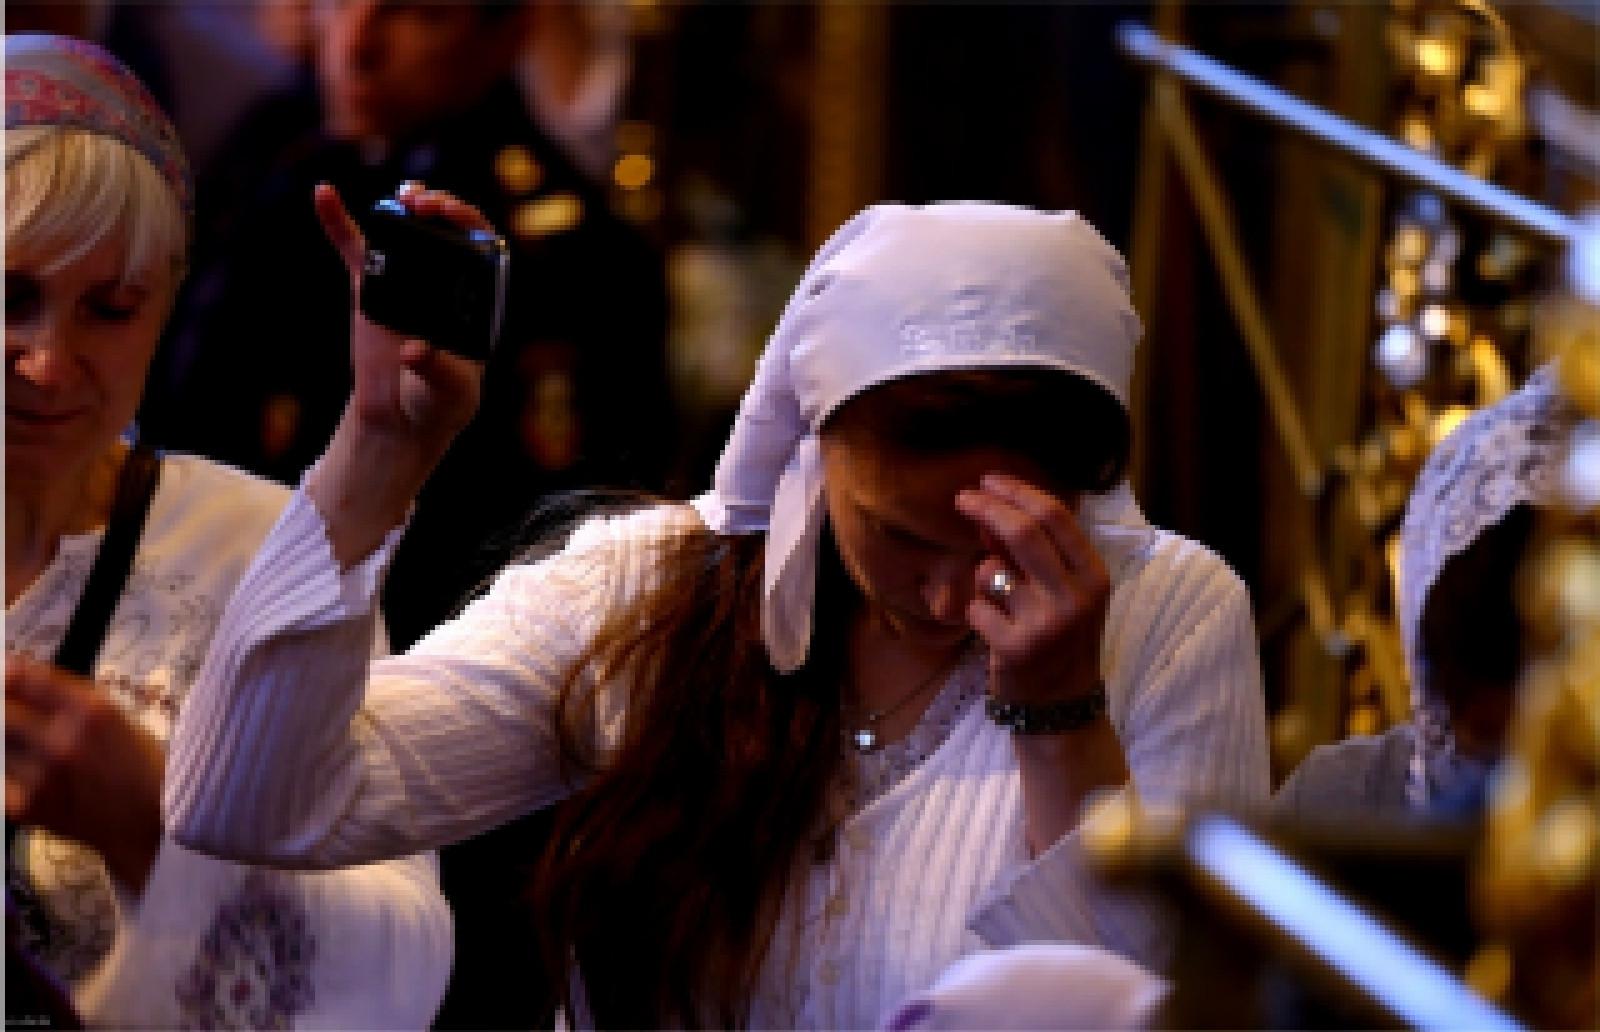 ВРПЦ прокомментировали селфи прихожан изхрамов схэштегом #Пасха